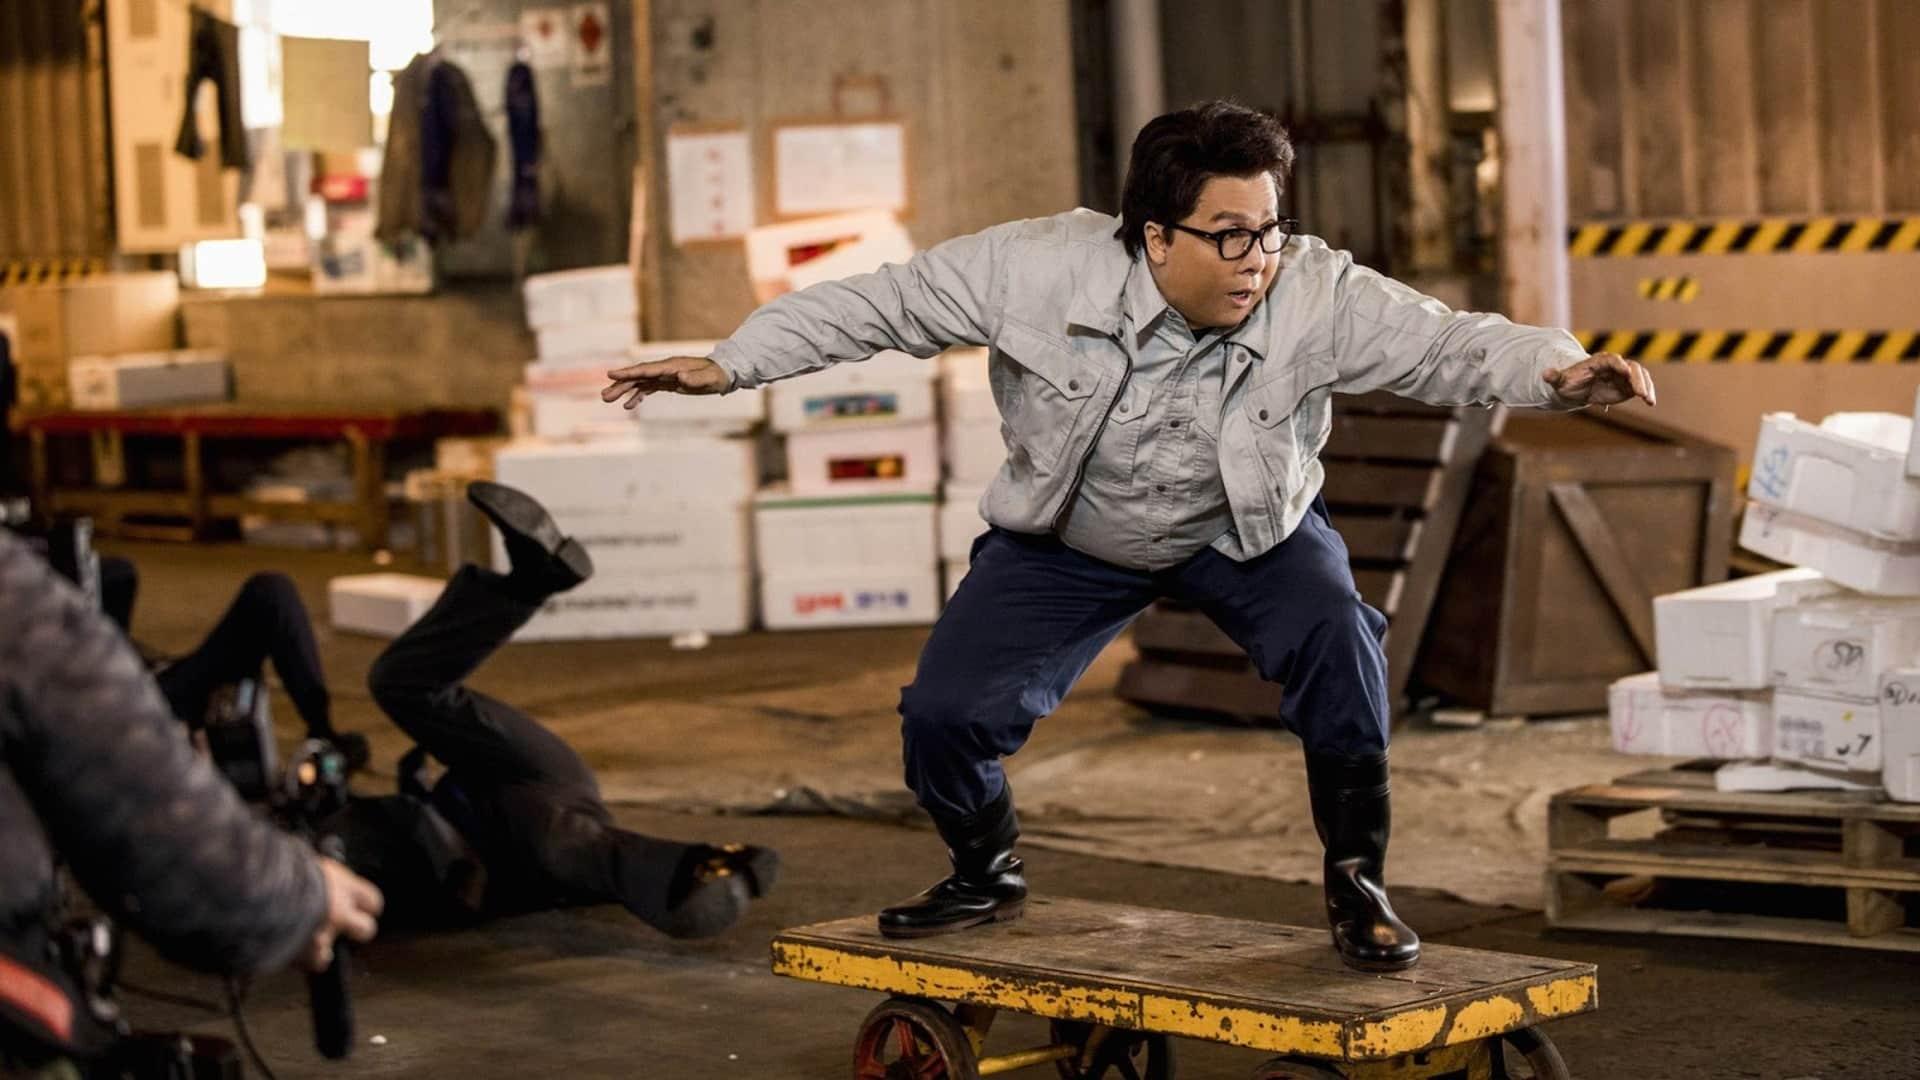 Enter the Fat Dragon trailer Donnie Yen